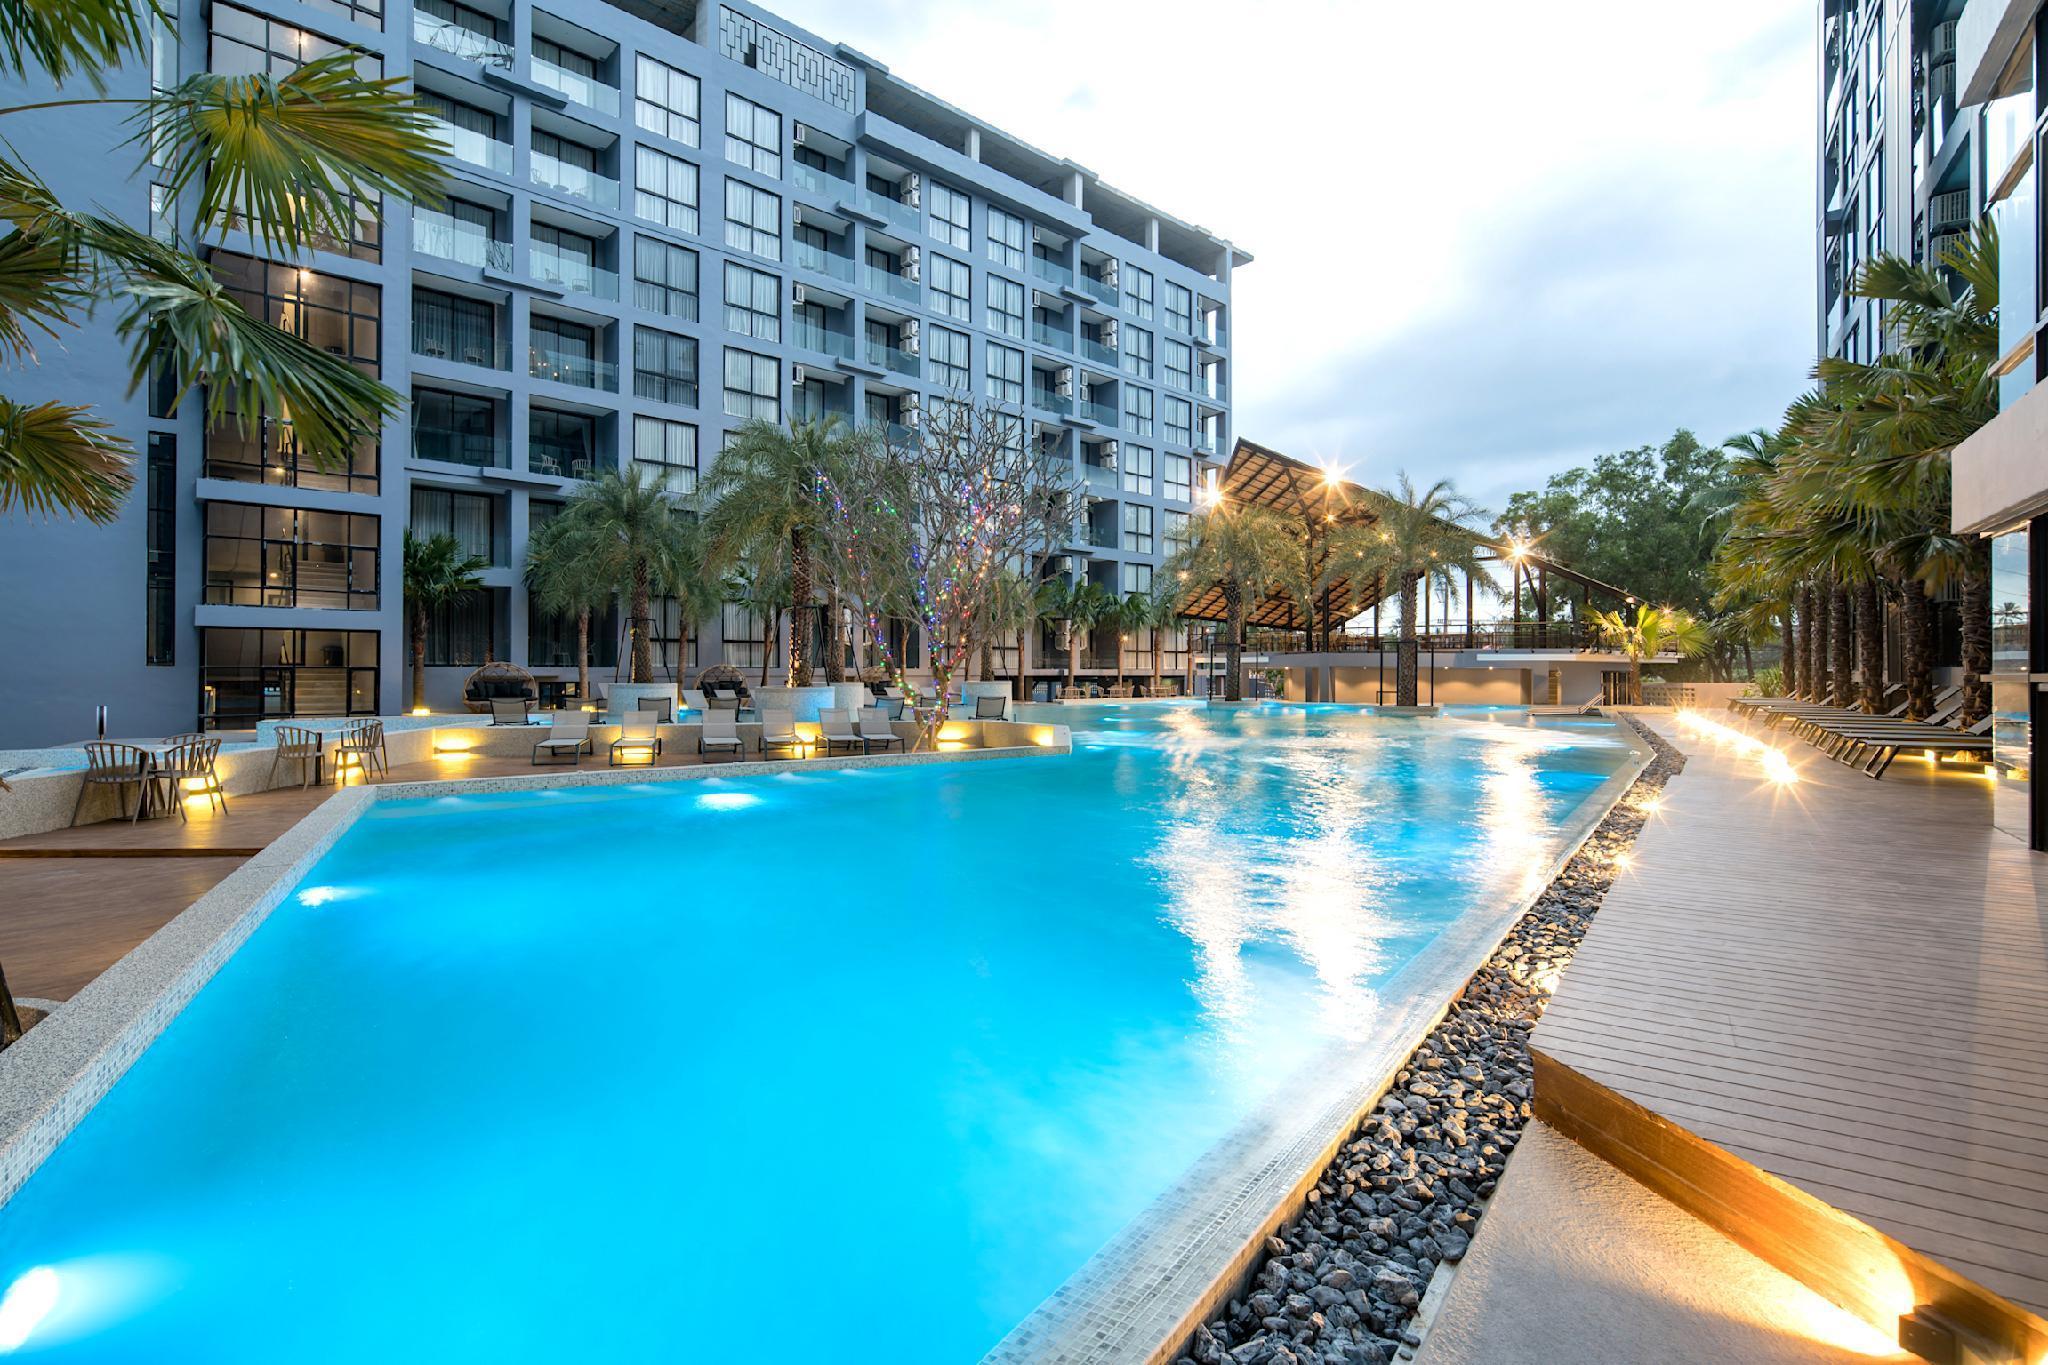 City Gate Residence Resort and Medical Center Phuket ซิตี้เกท เรสซิเดนซ์ รีสอร์ต แอนด์ เมดิคัล เซ็นเตอร์ ภูเก็ต